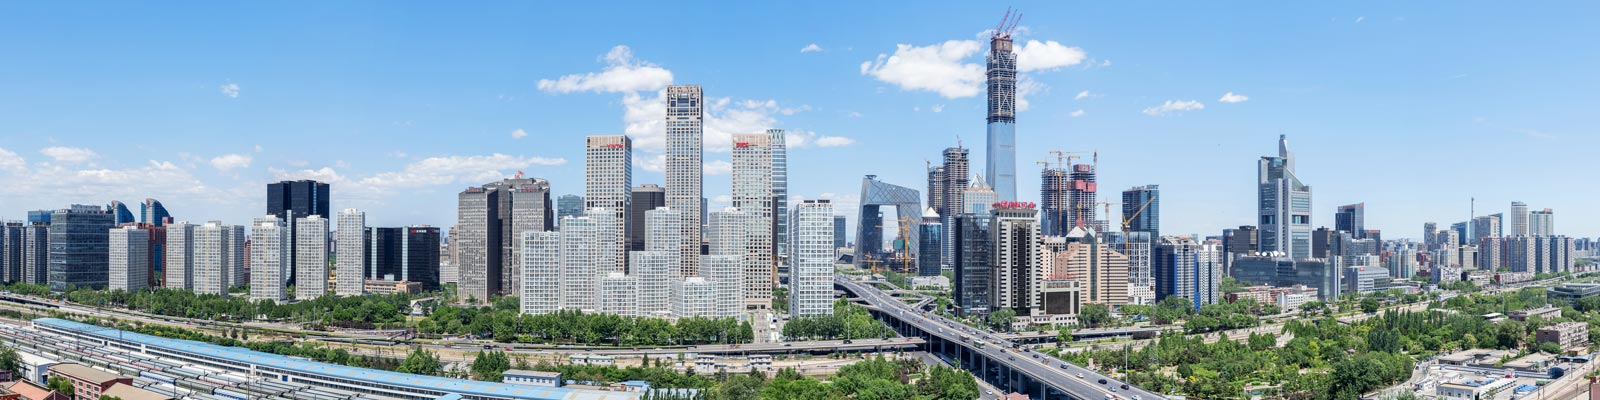 MATLAB & Simulink Jobs | Beijing, China - MathWorks España